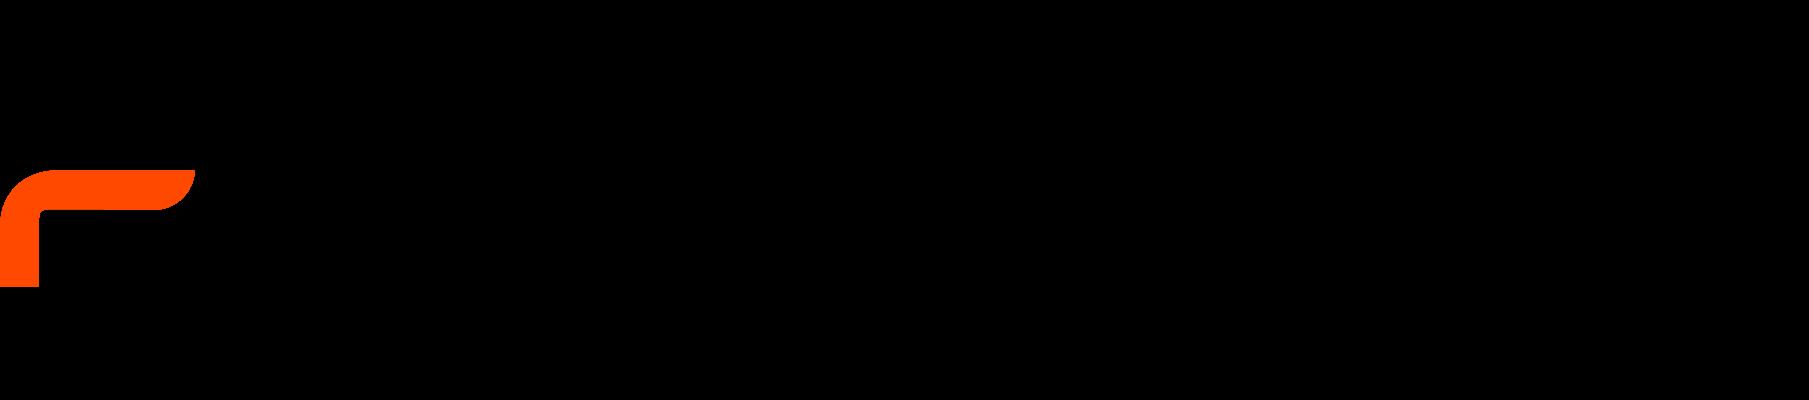 Finsecur